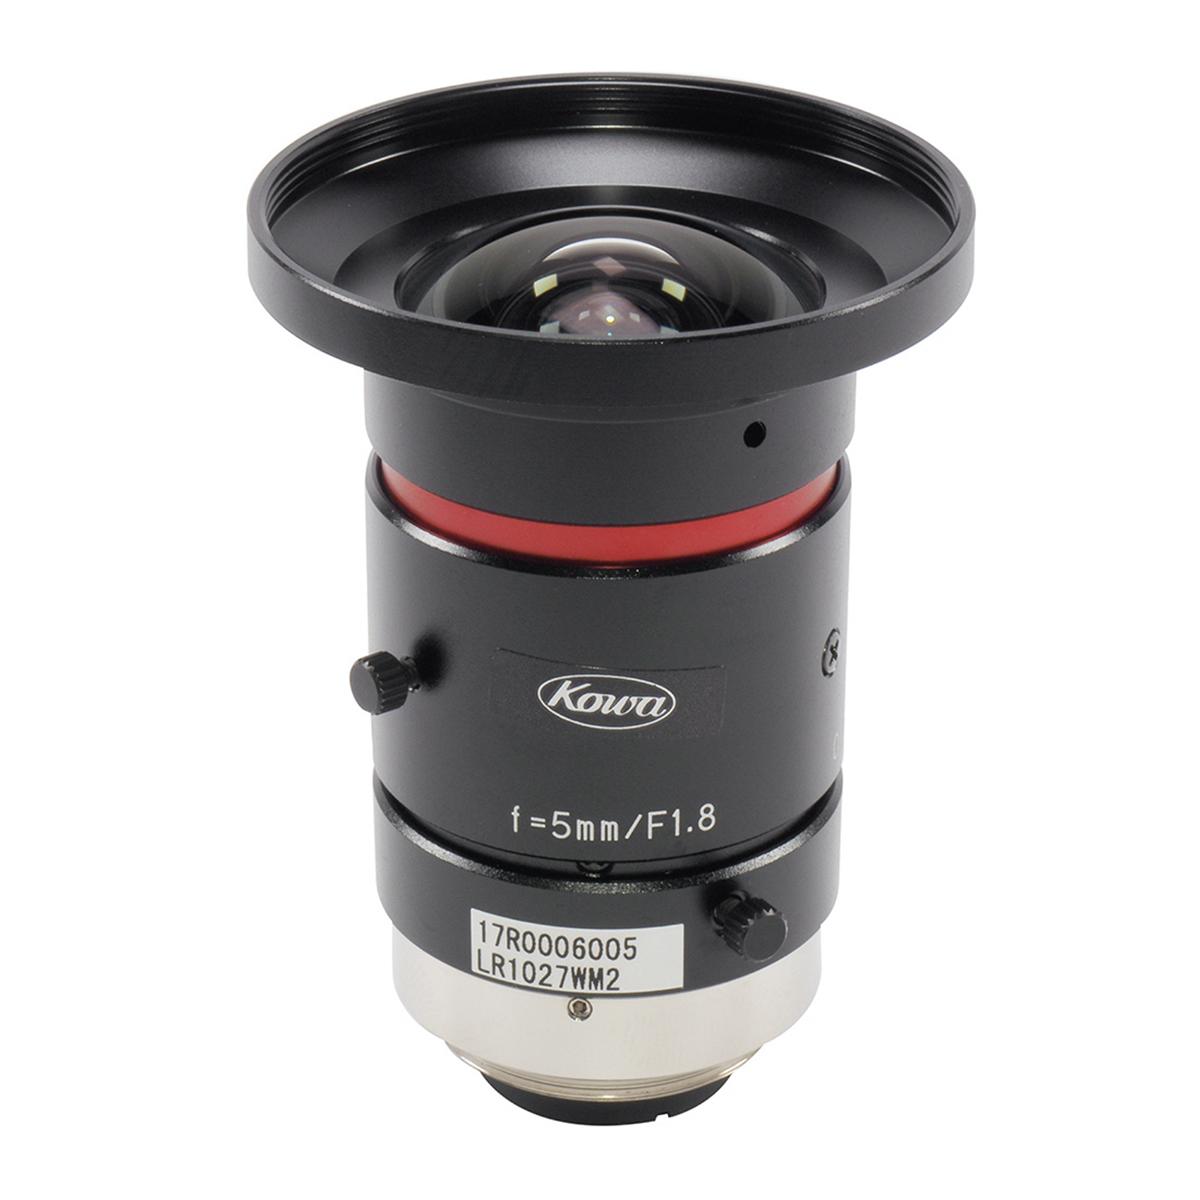 Kowa LM5JC10M lens